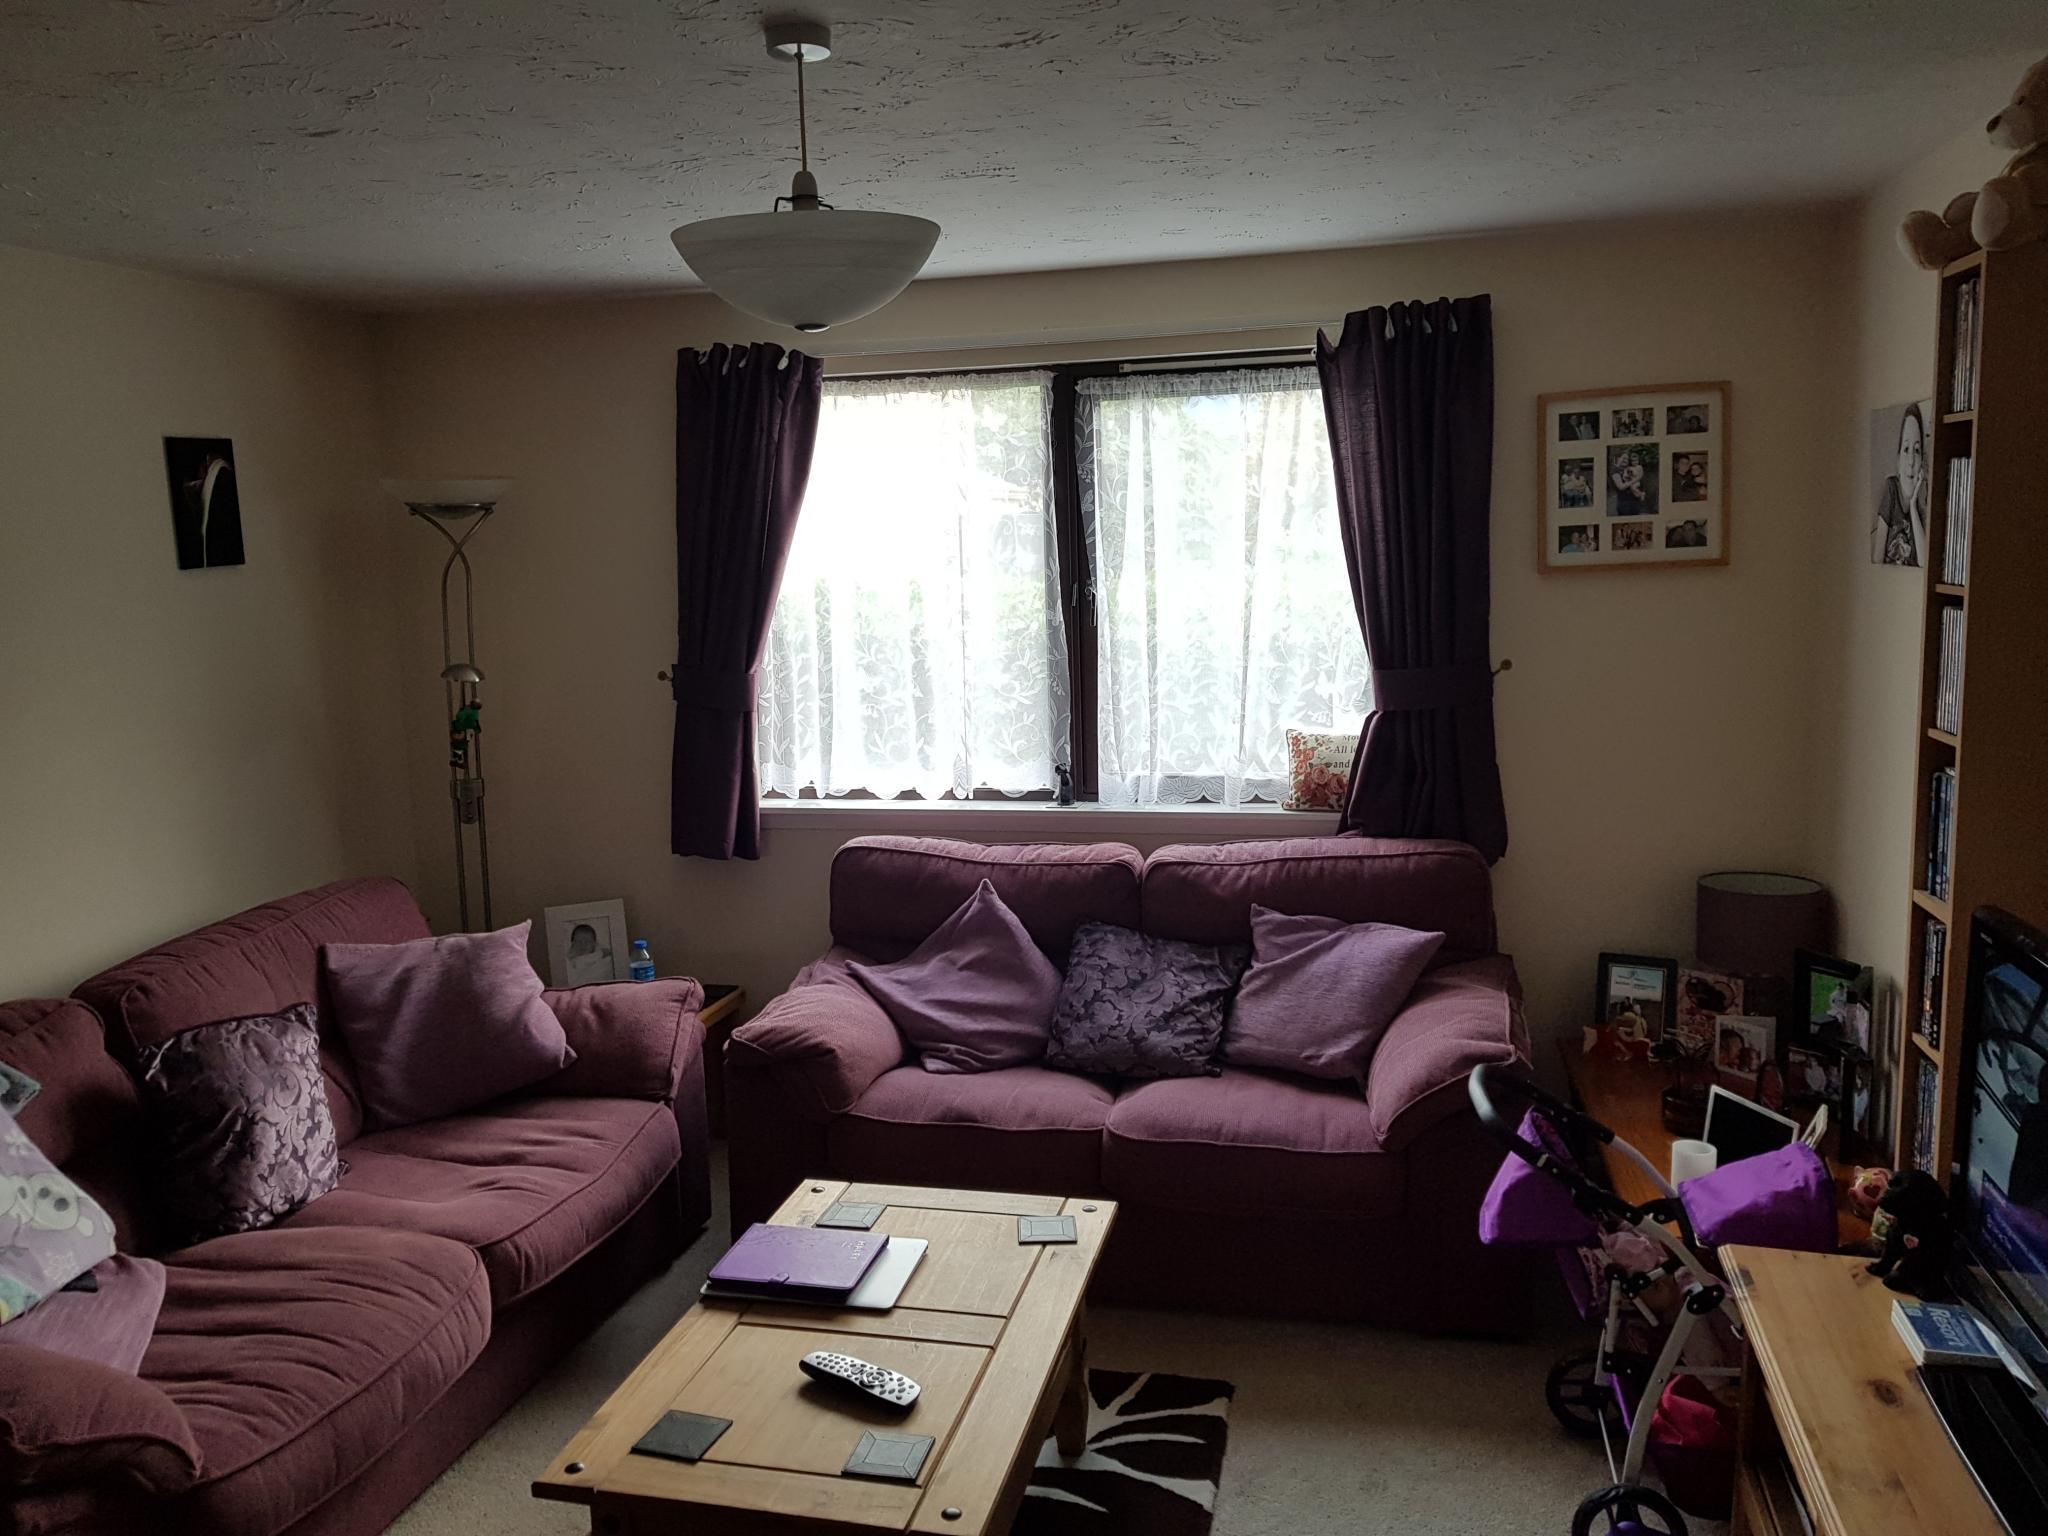 2 bedroom semi-detached house SSTC in Rendlesham, Woodbridge - Photograph 3